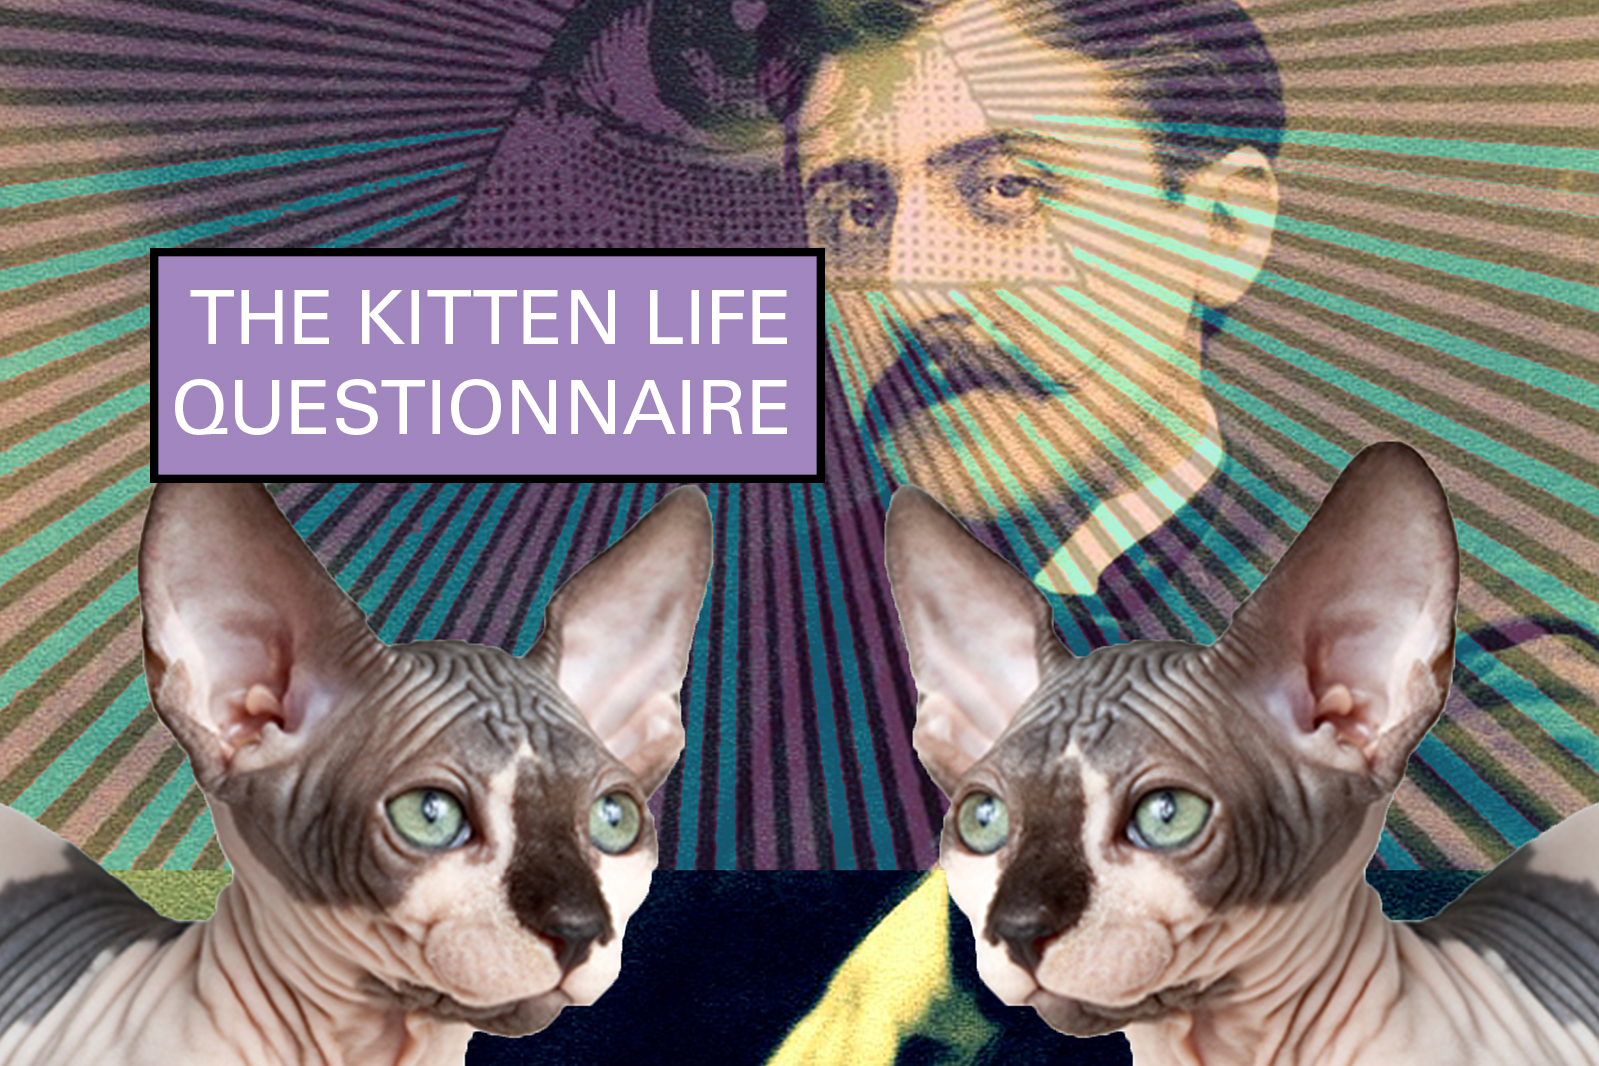 the kitten life, proust questionnaire, the kitten life questionnaire